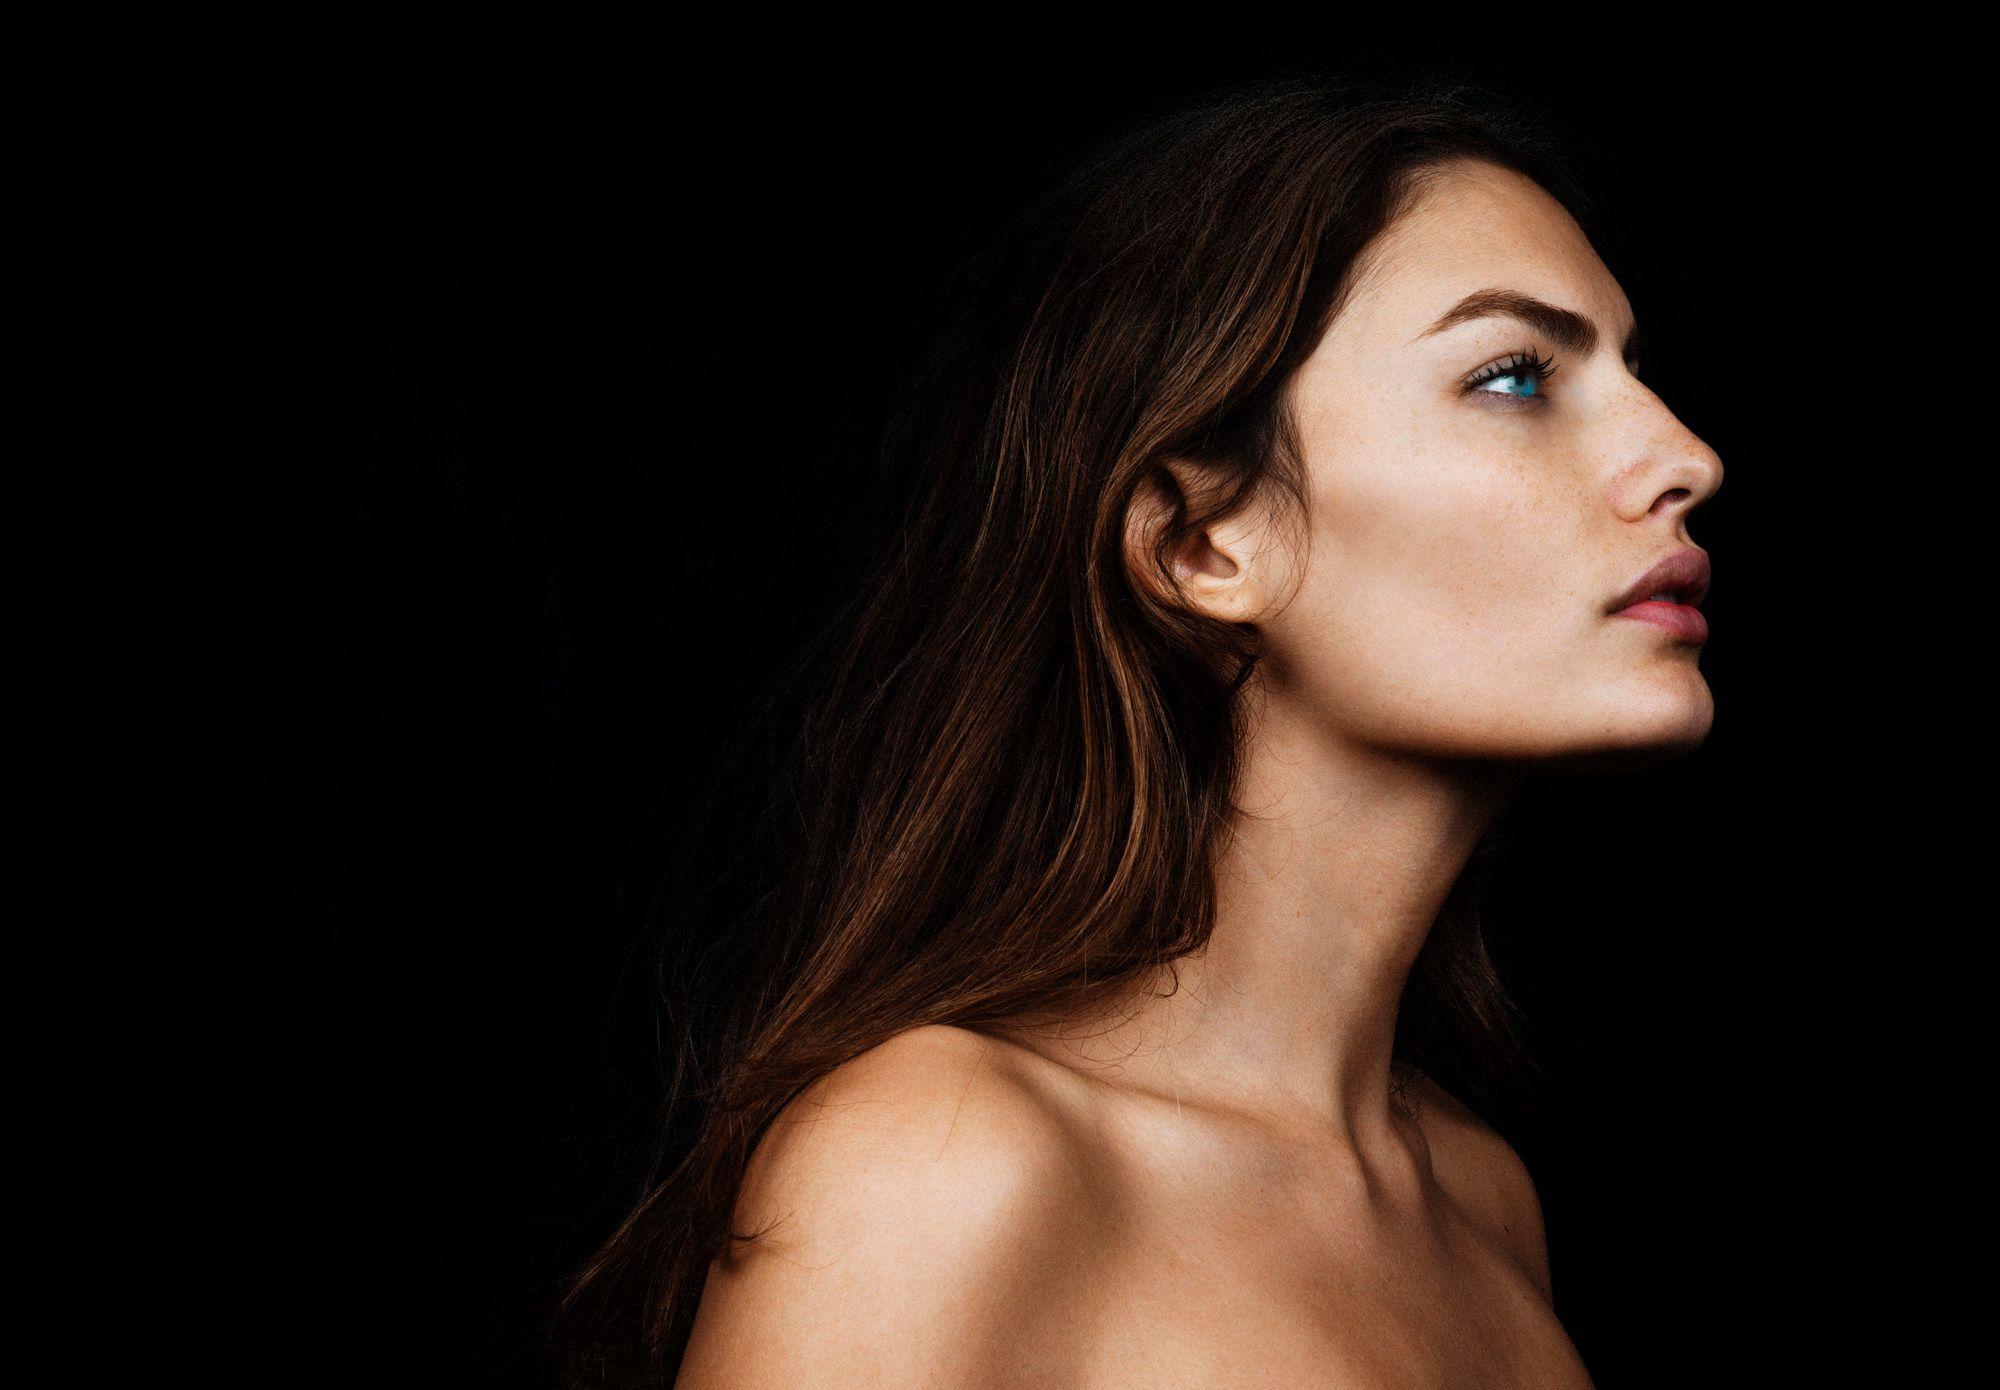 Alyssa miller naked - 2019 year